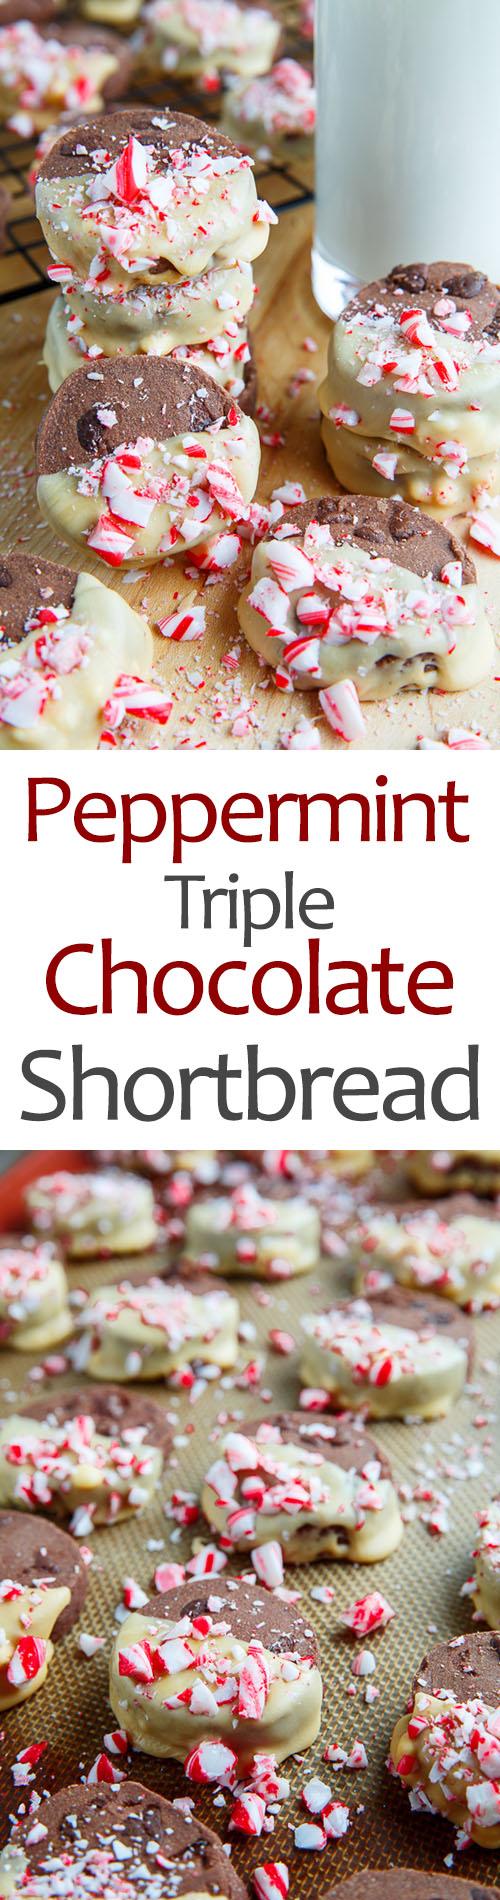 Peppermint Triple Chocolate Shortbread